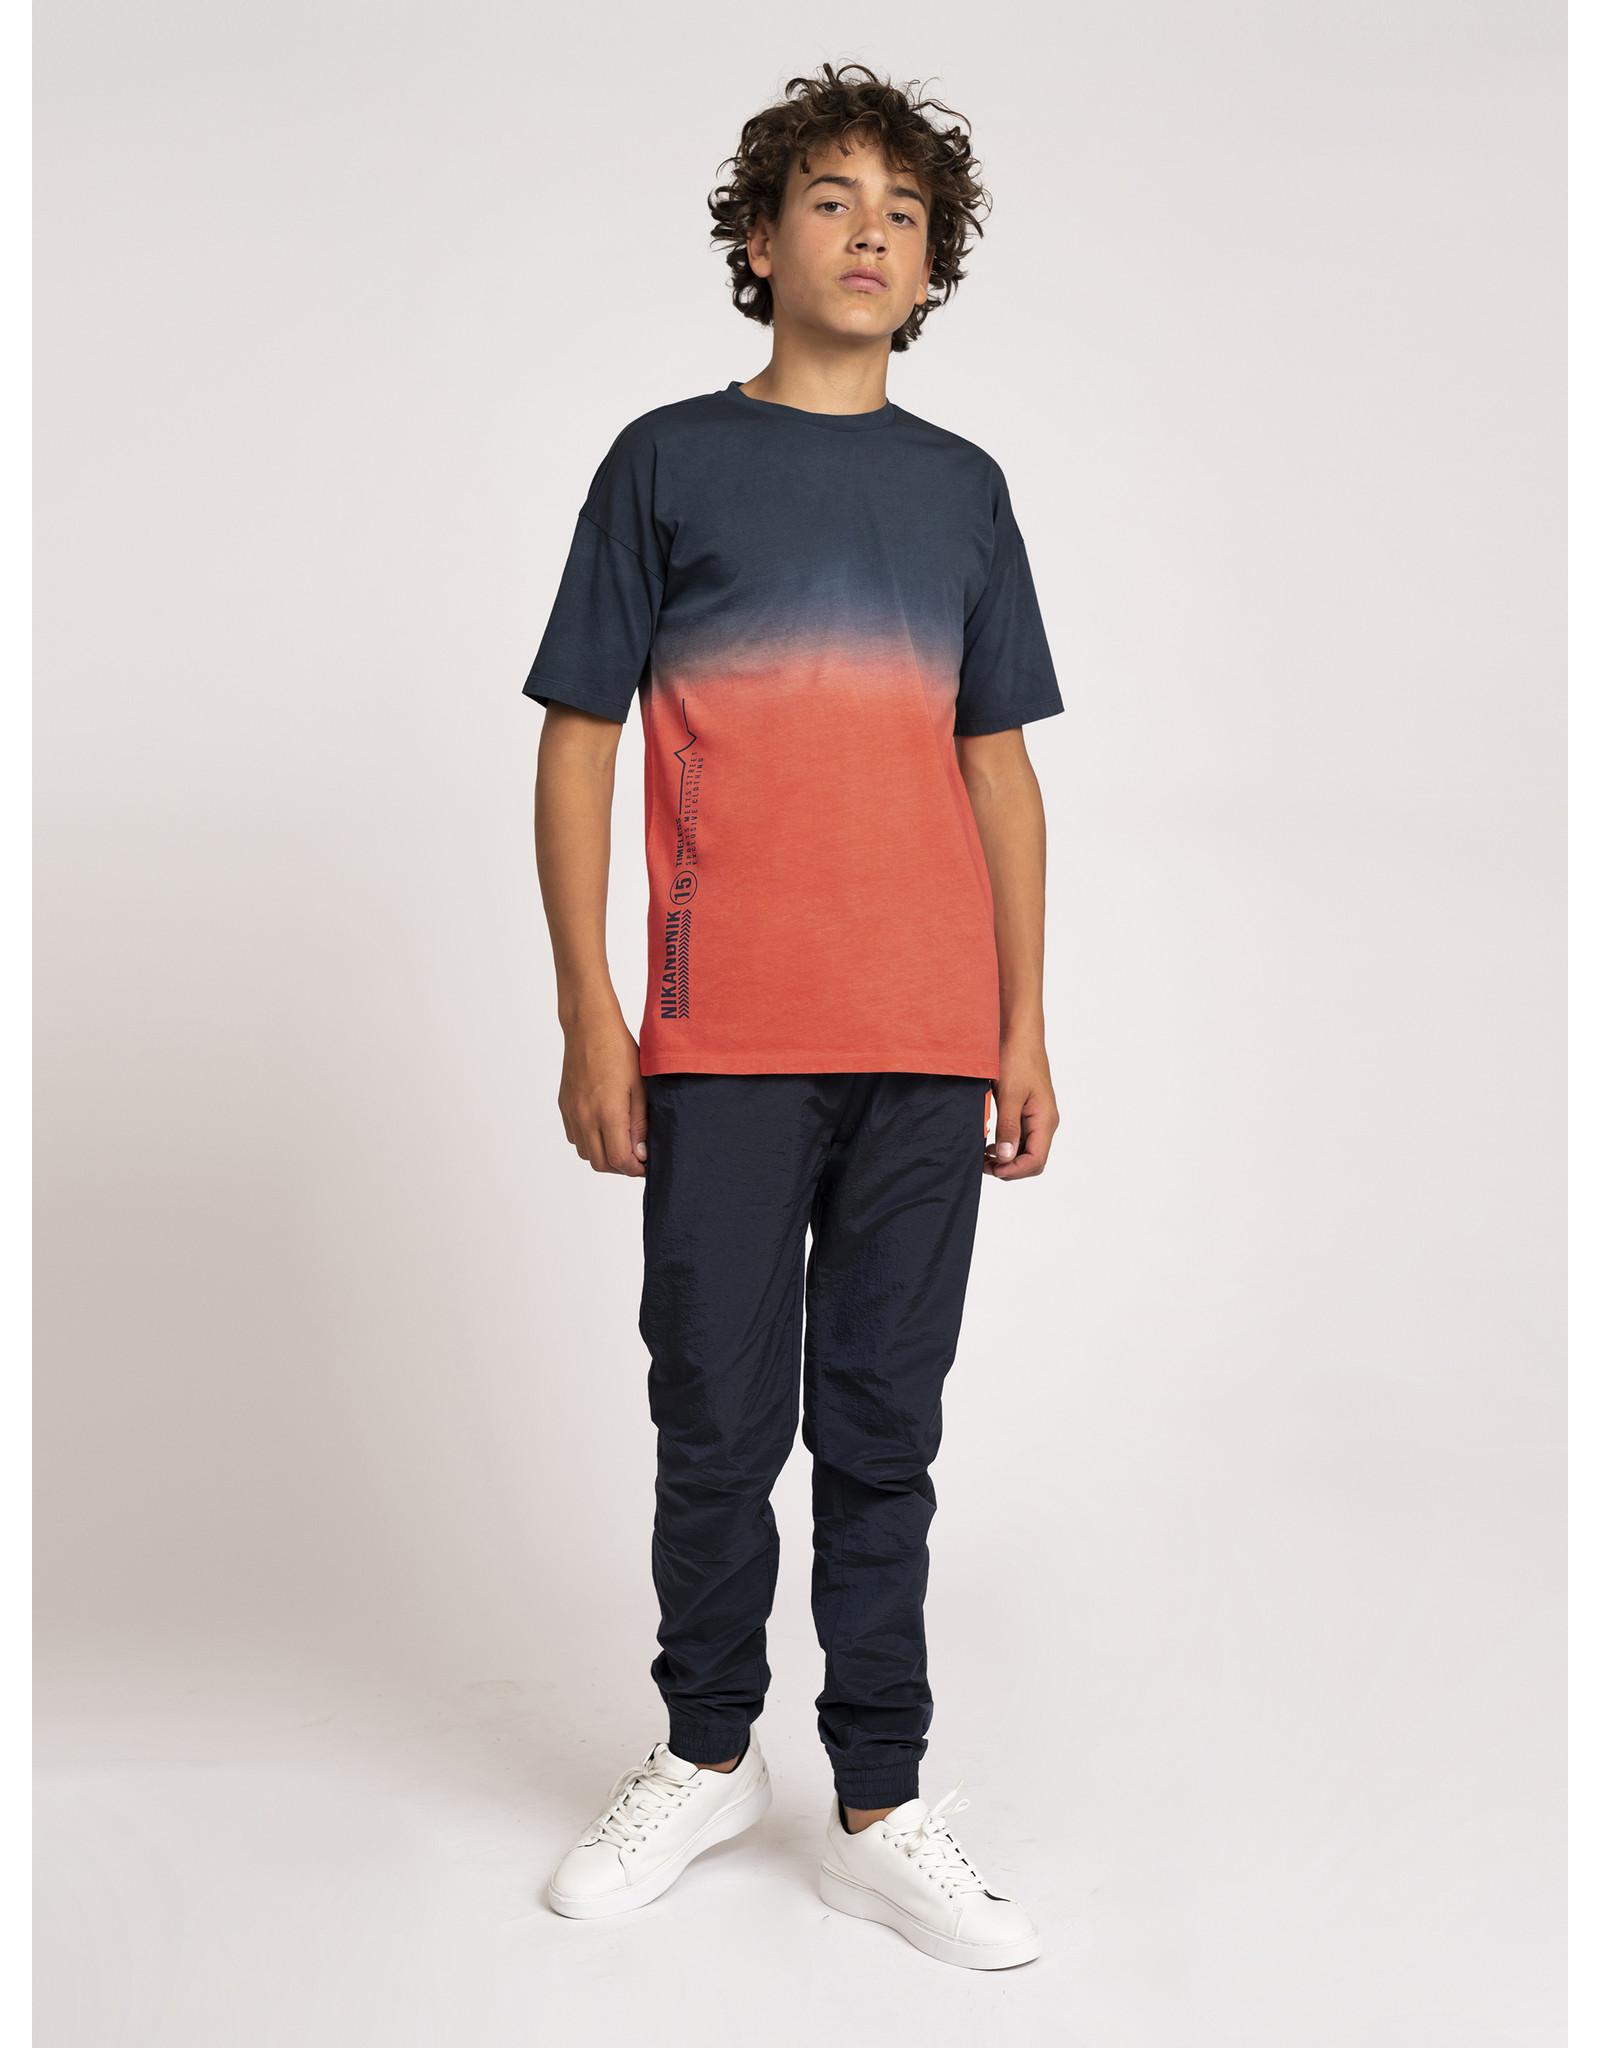 Nik&Nik NIK&NIK August T-shirt Lobster Red